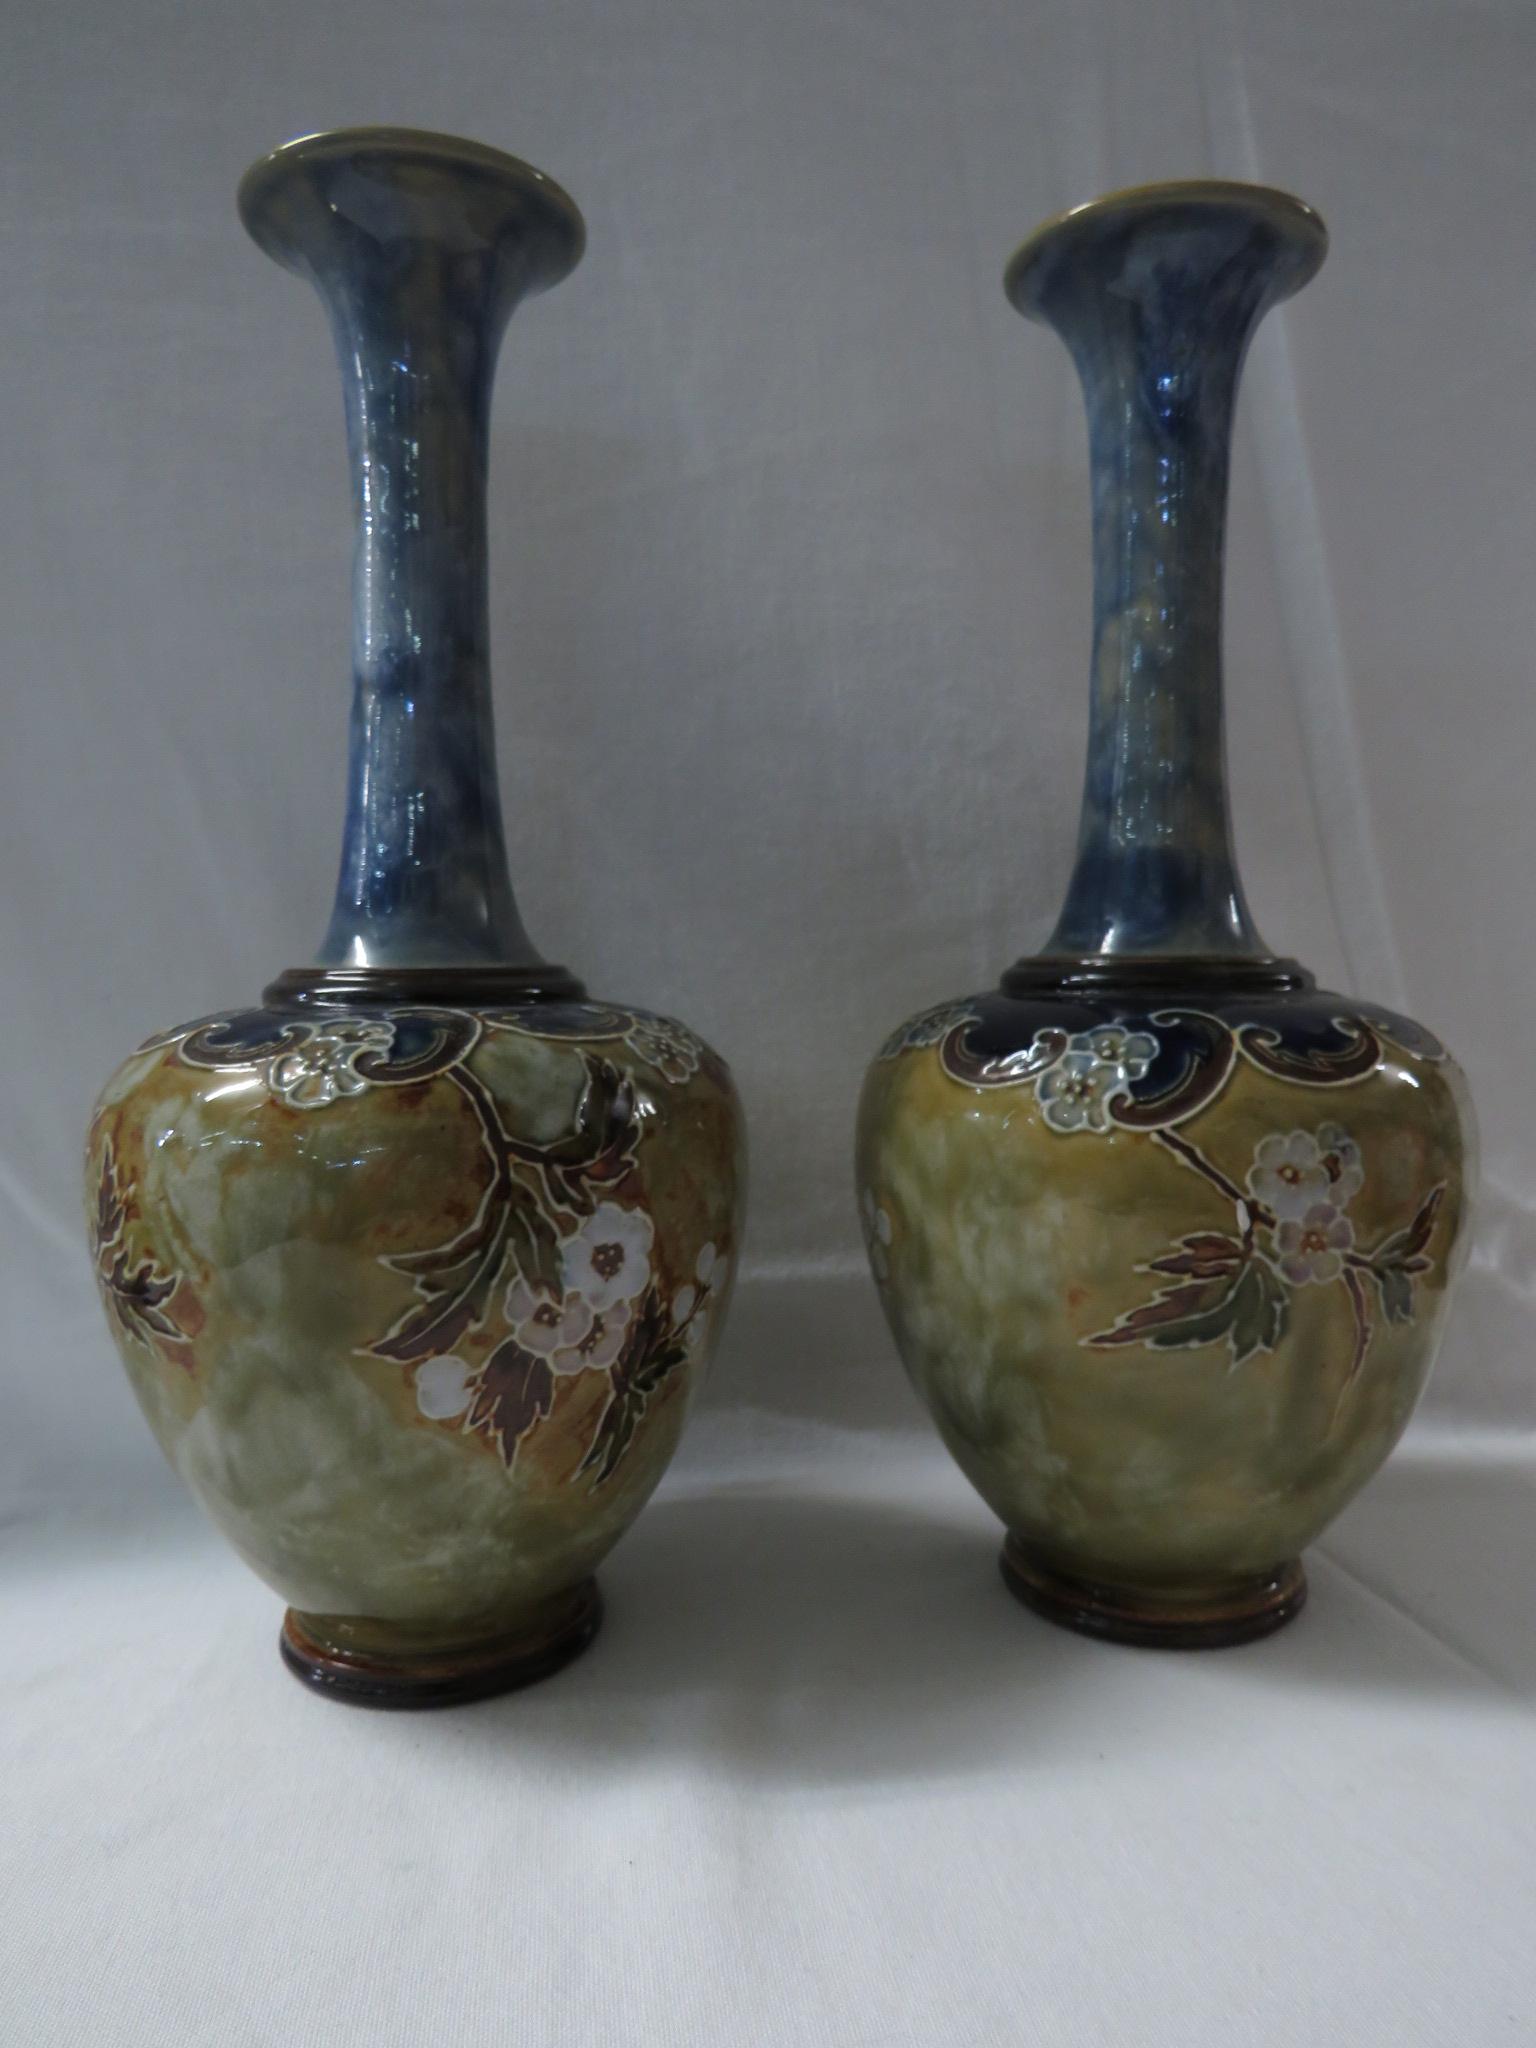 Lot 50 - Pair of Royal Doulton bottle vases, pale blue glazed neck, the bodies with tubed line decoration